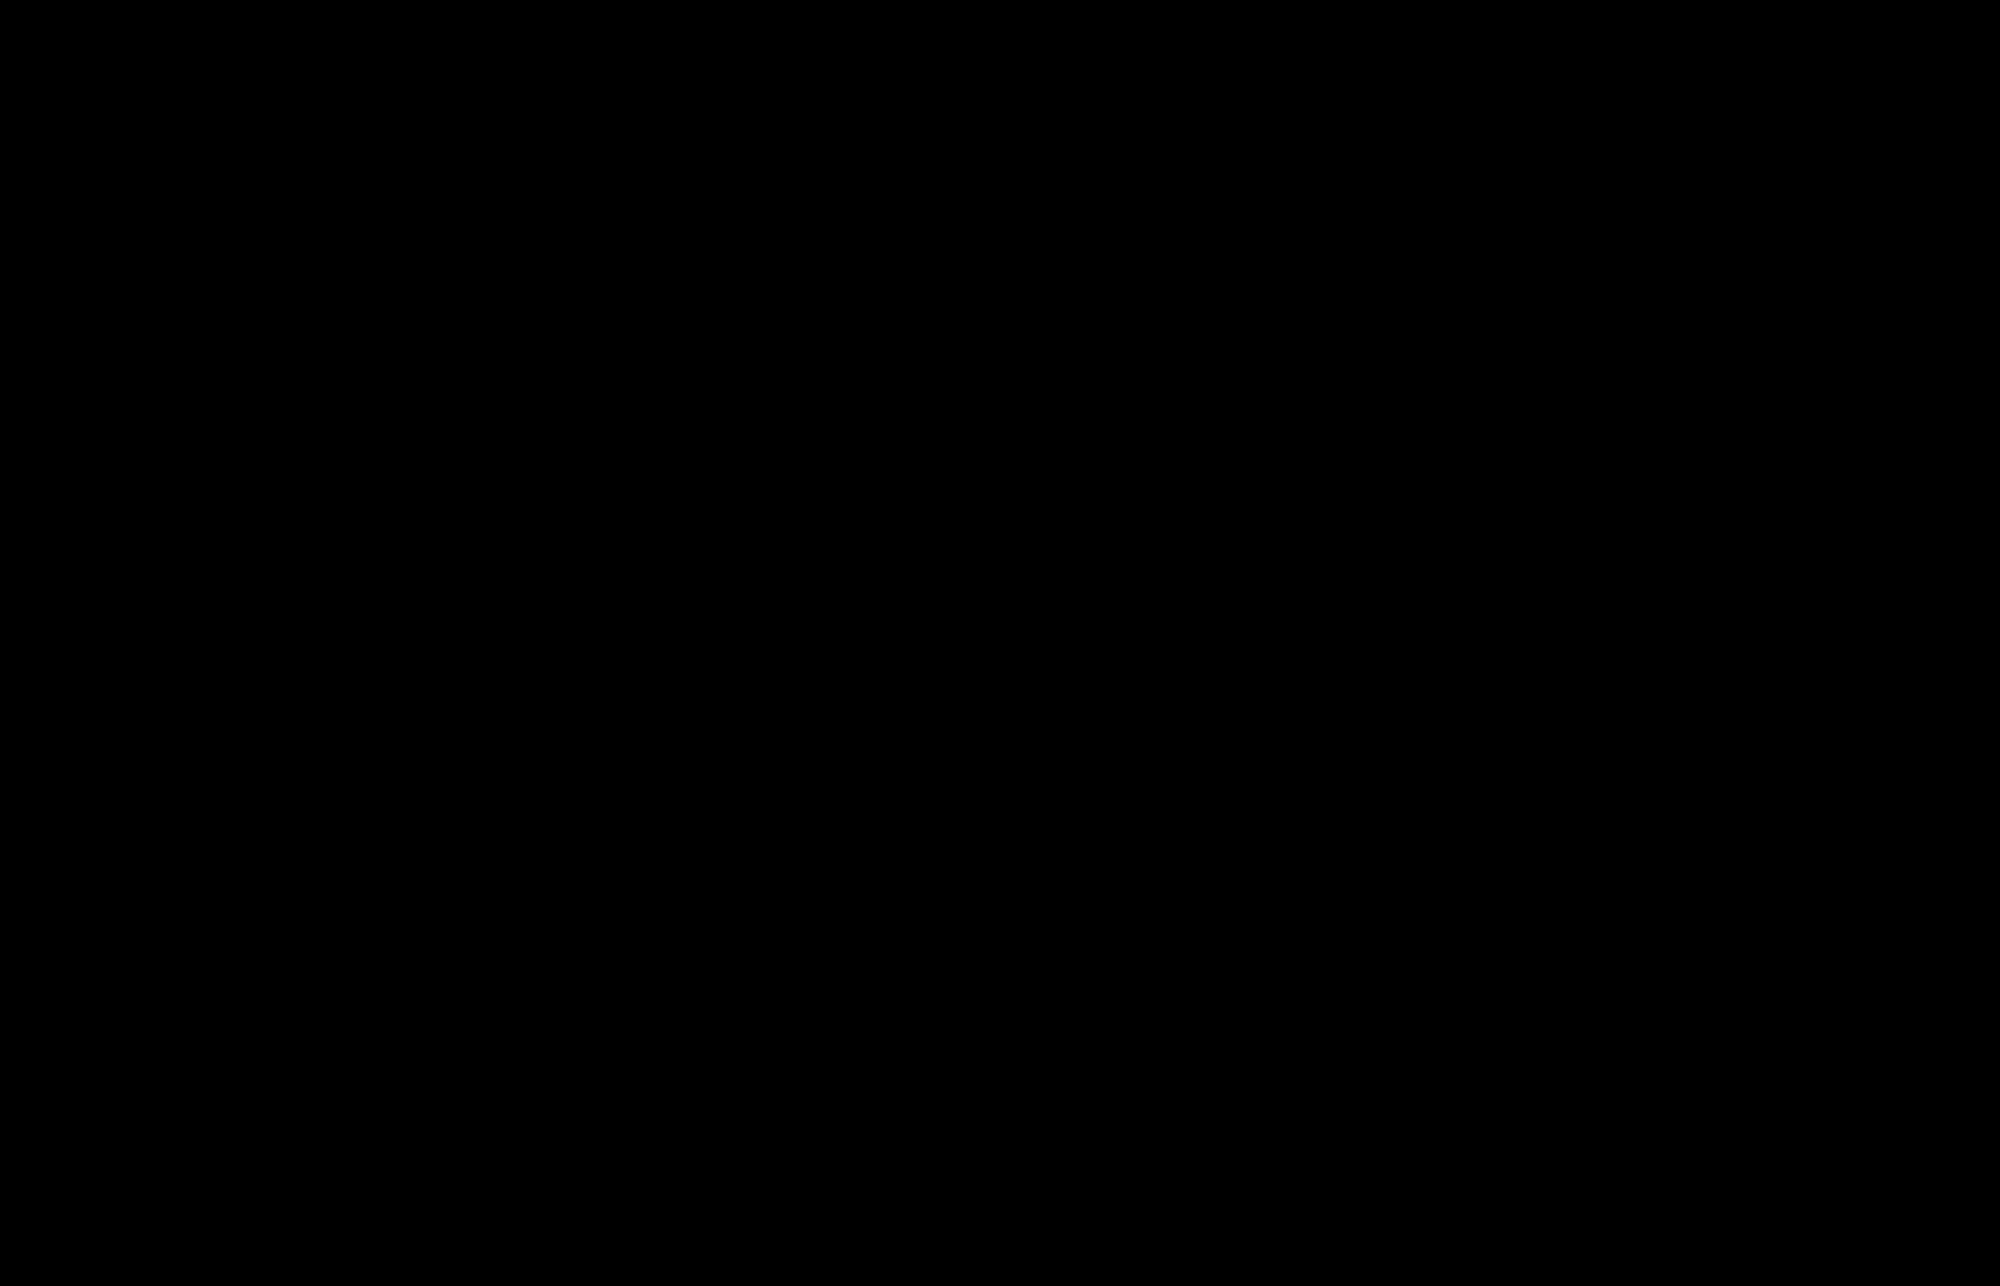 G R M-logo-black (1).png